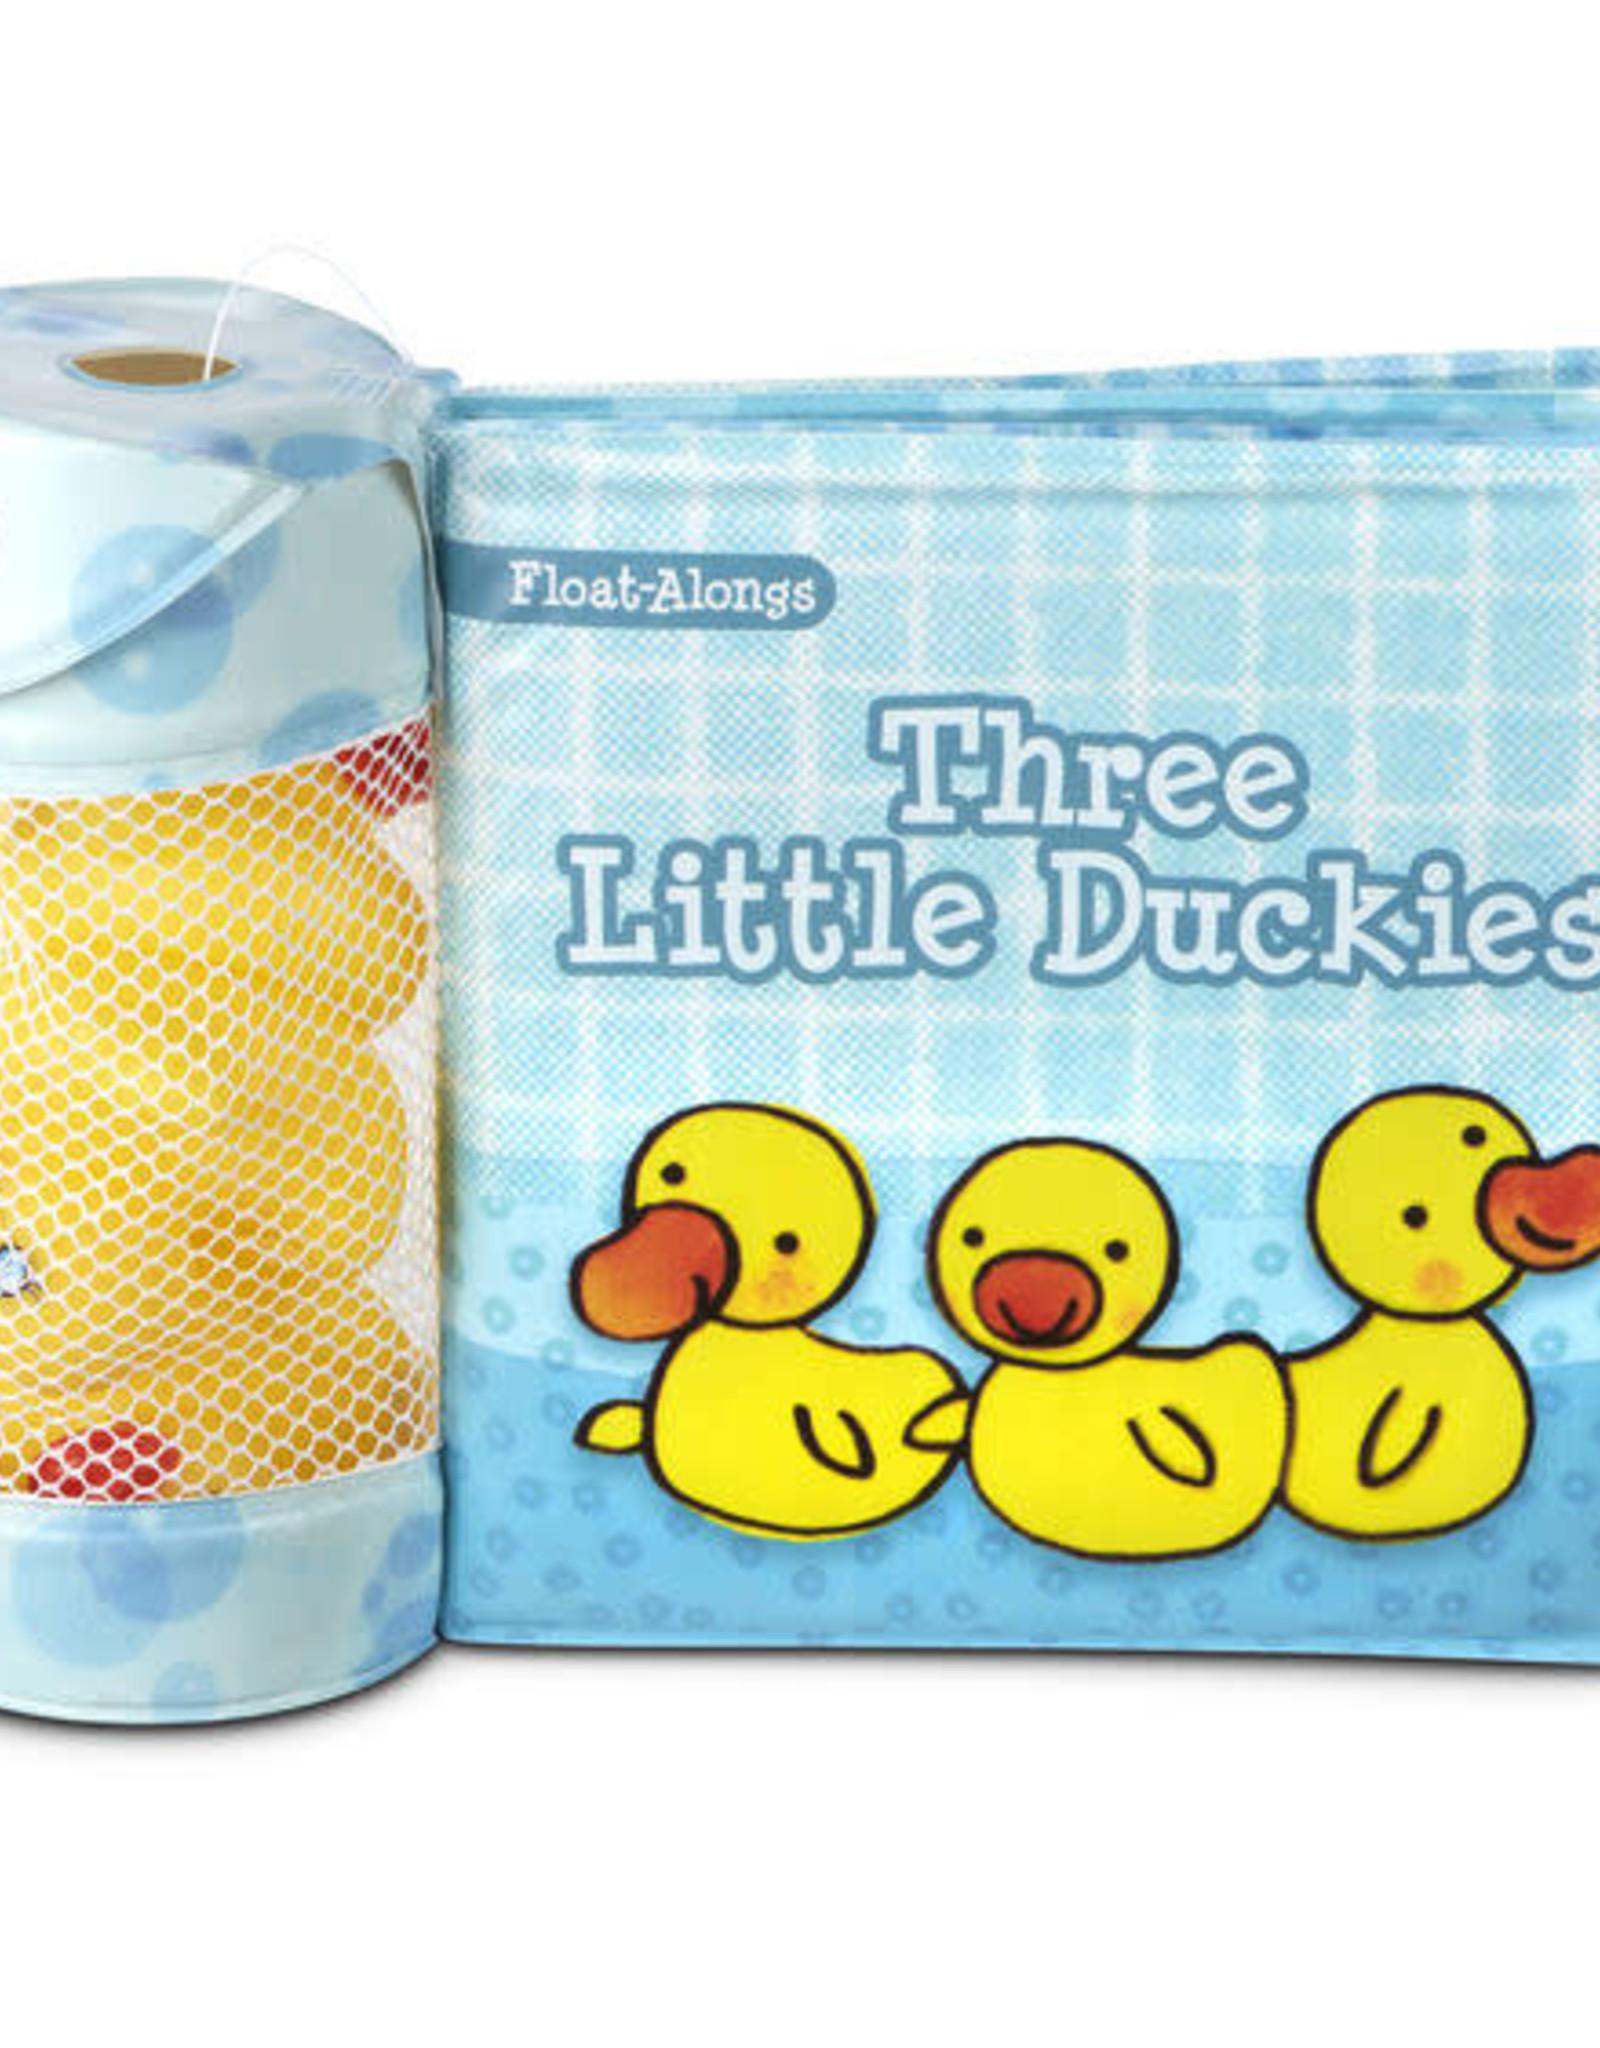 Melissa & Doug Float Alongs: Three Little Duckies